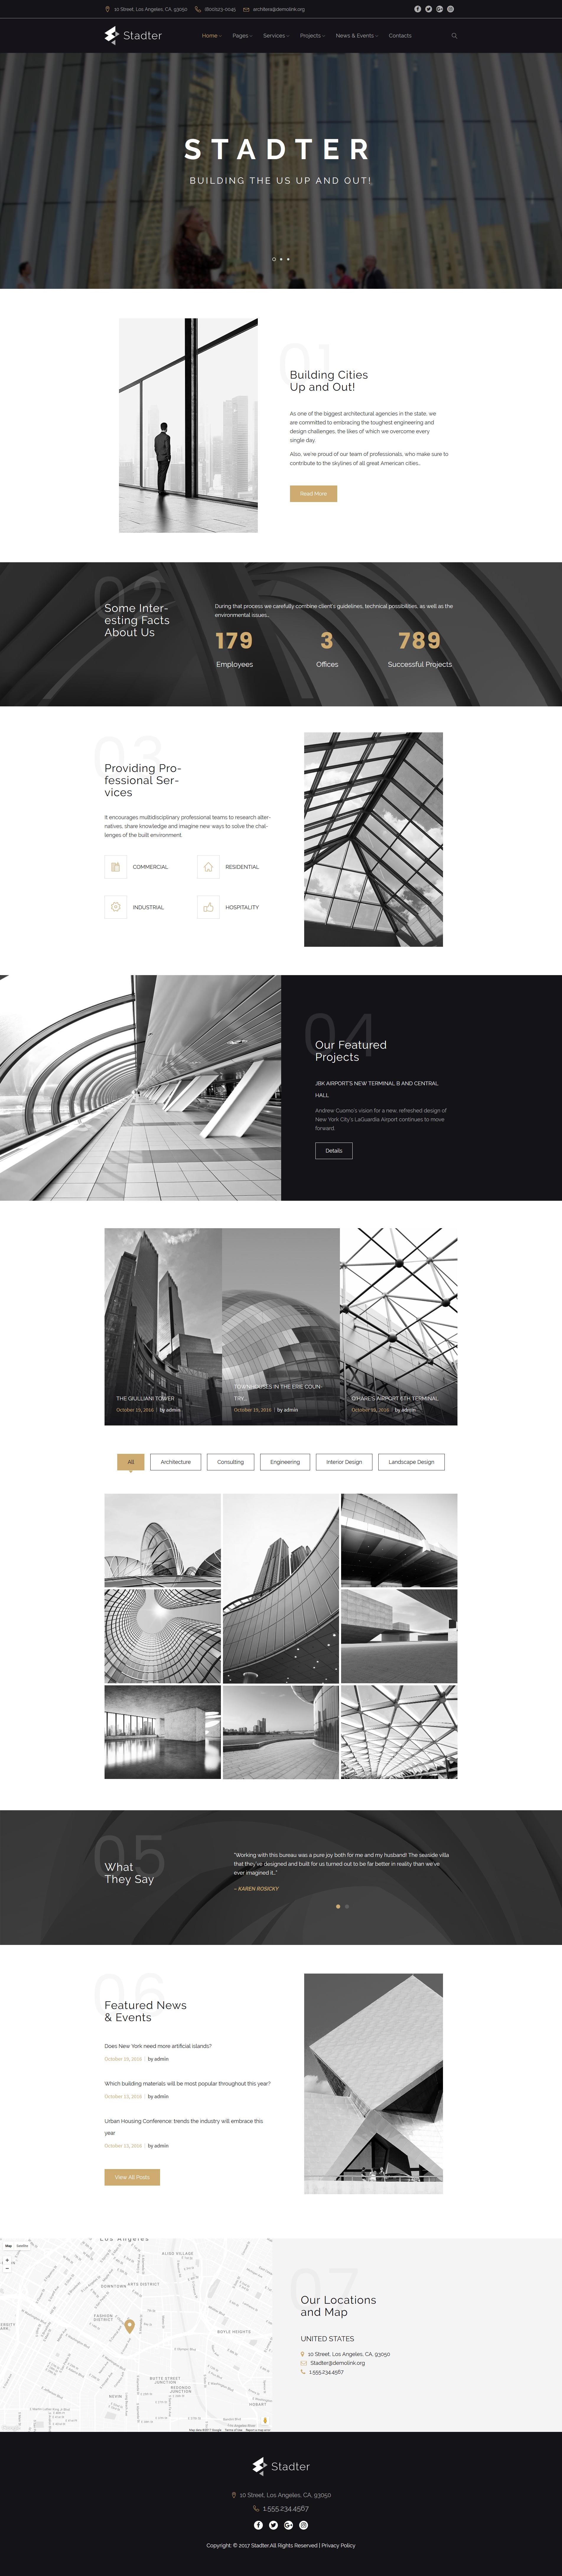 """Stadter - Construction Company"" - адаптивний WordPress шаблон №63956"